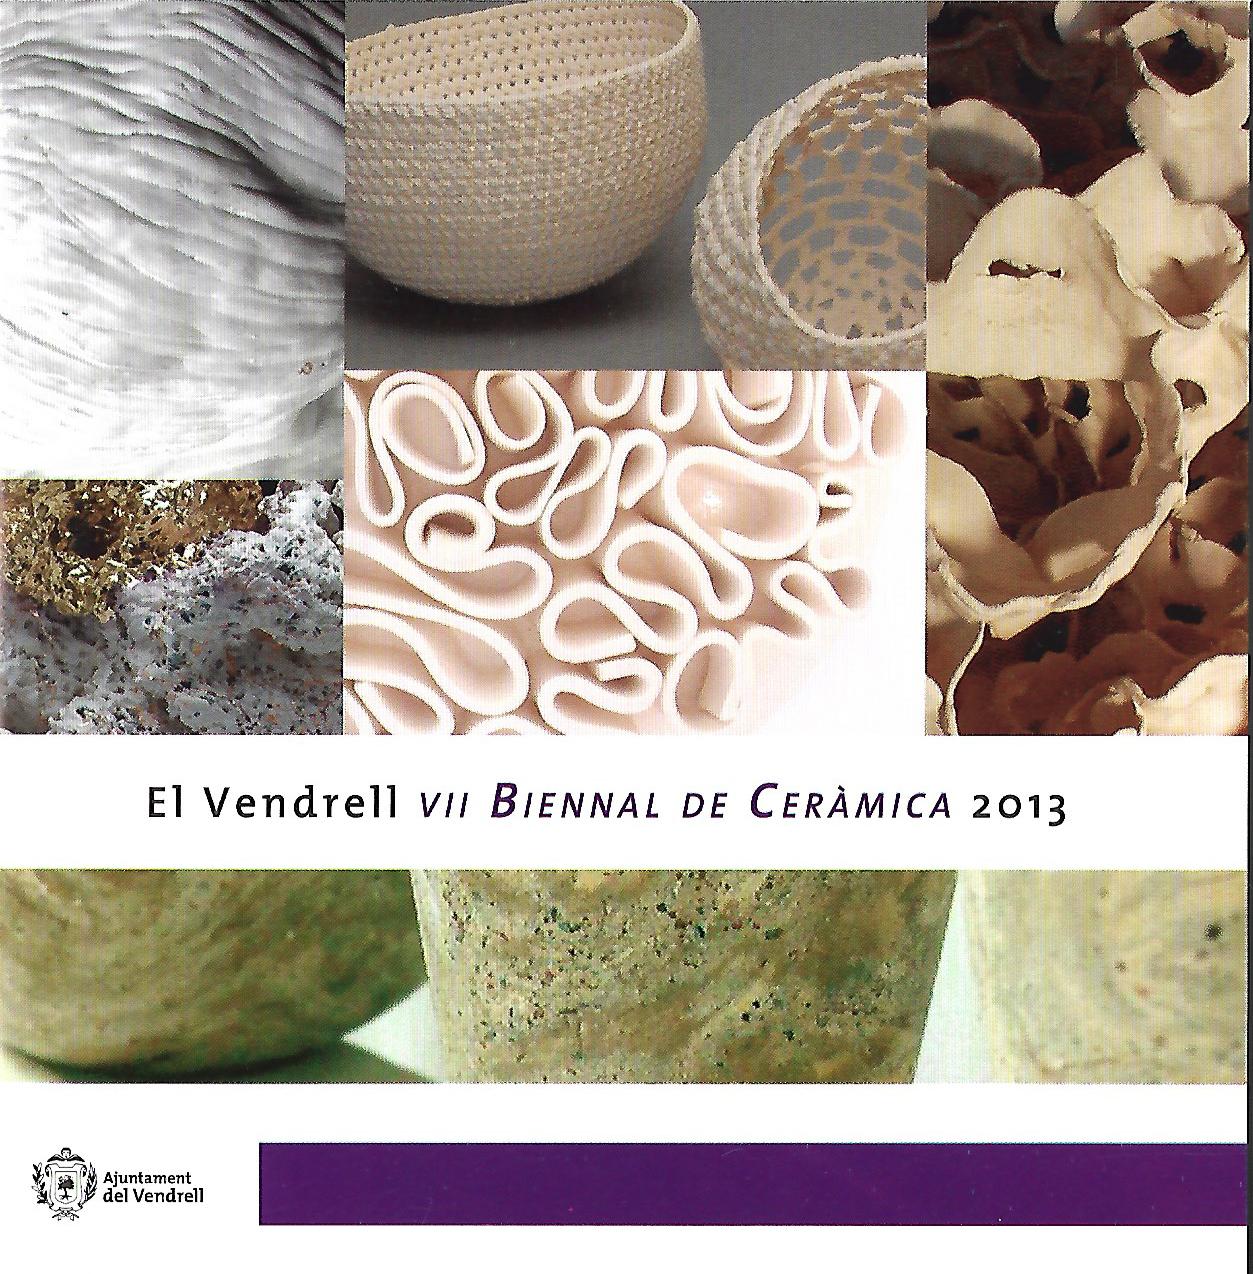 Biennal De Ceramica 2013